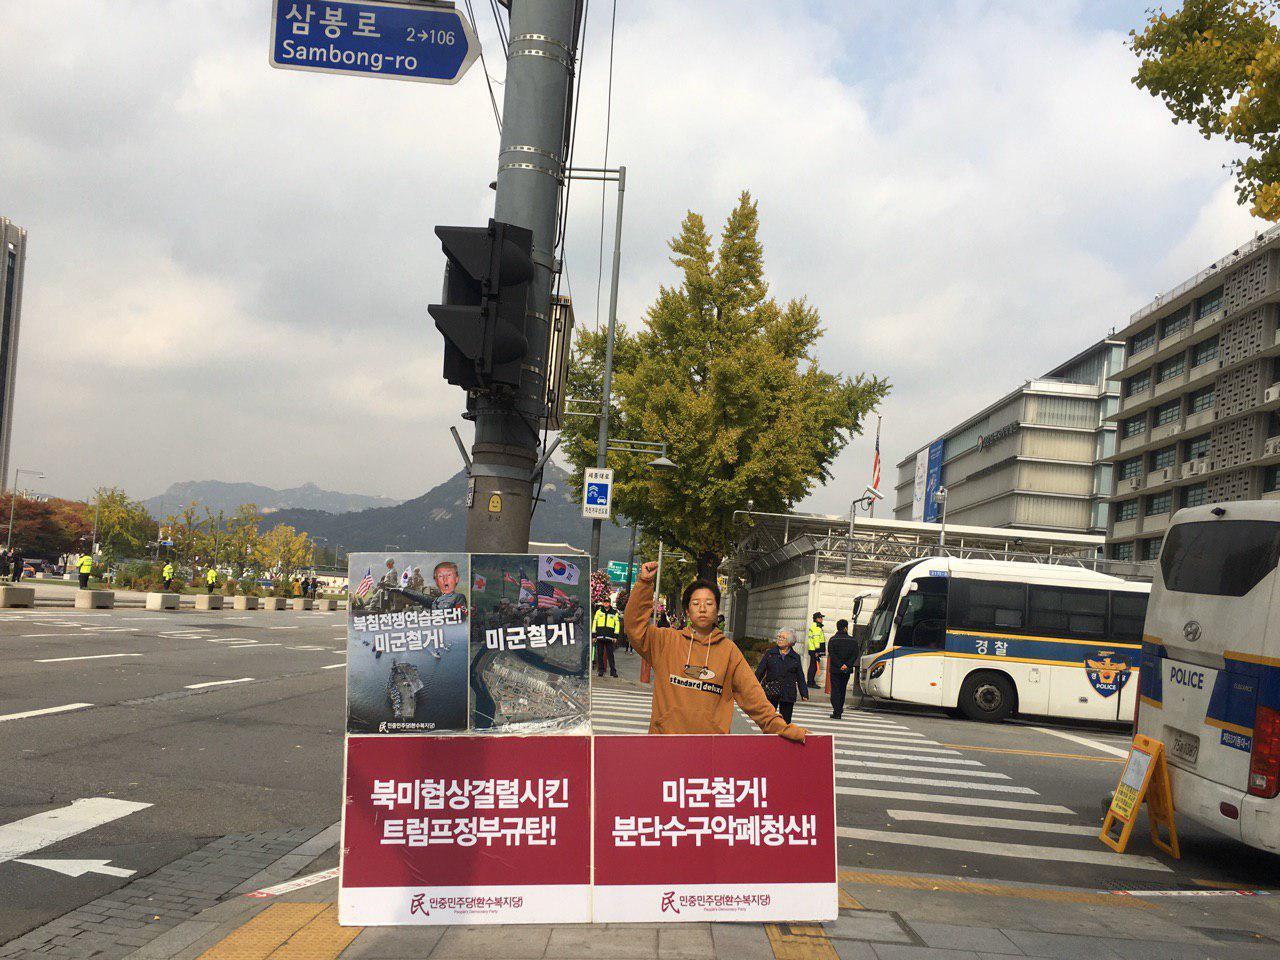 photo_2019-10-31_04-47-19.jpg